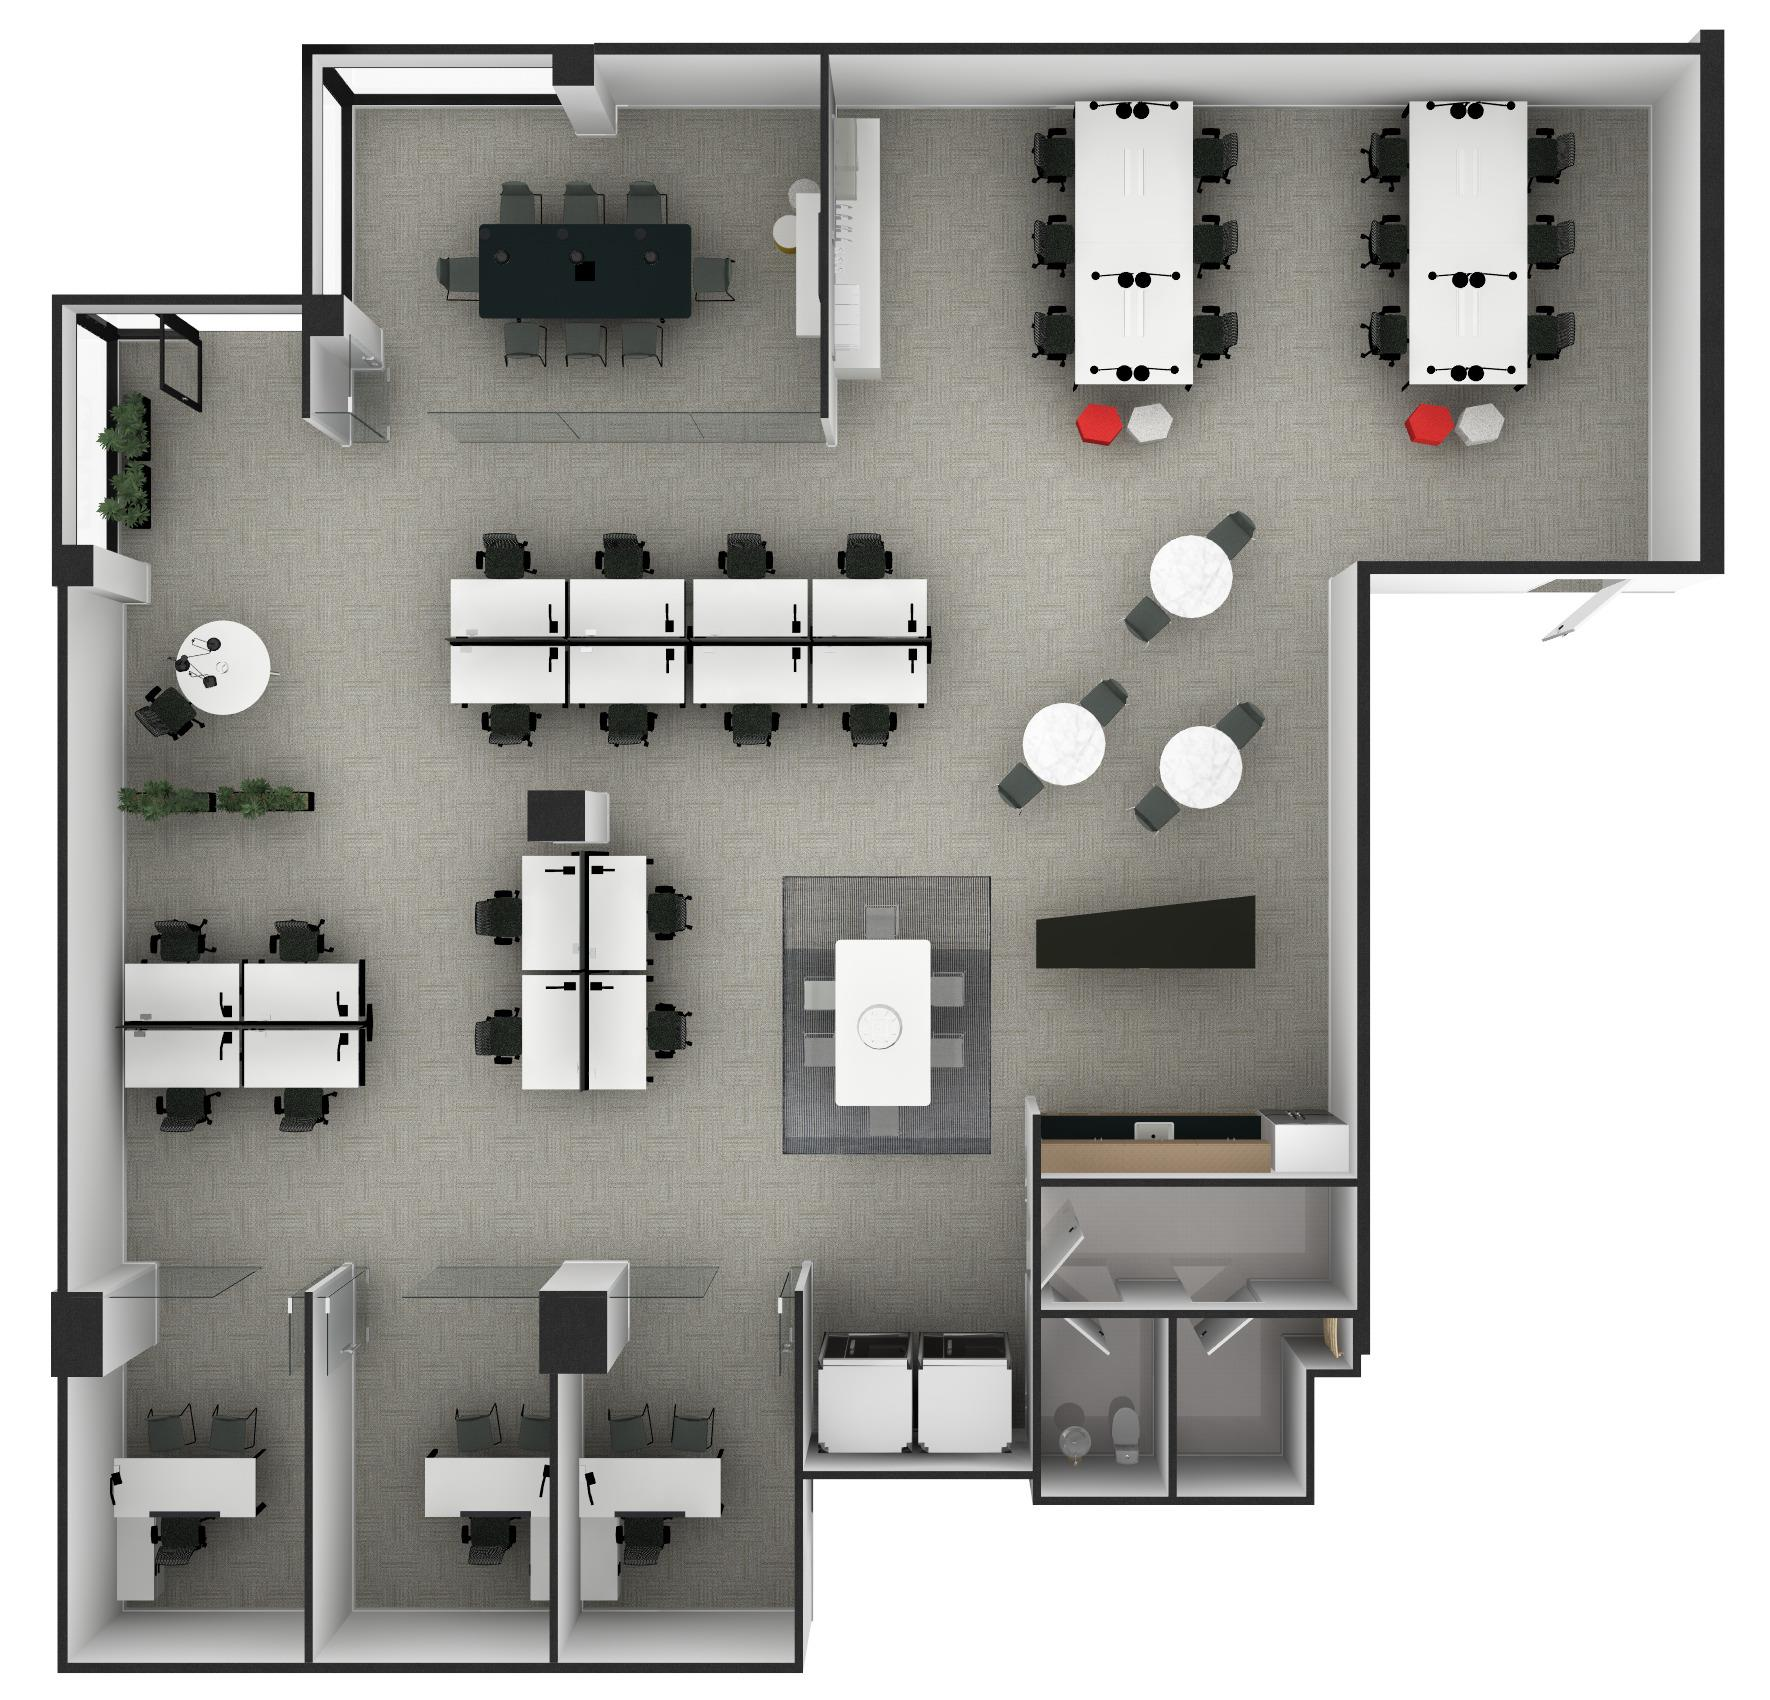 1900 Market Street   Brandywine - Suite 120 - altSpace